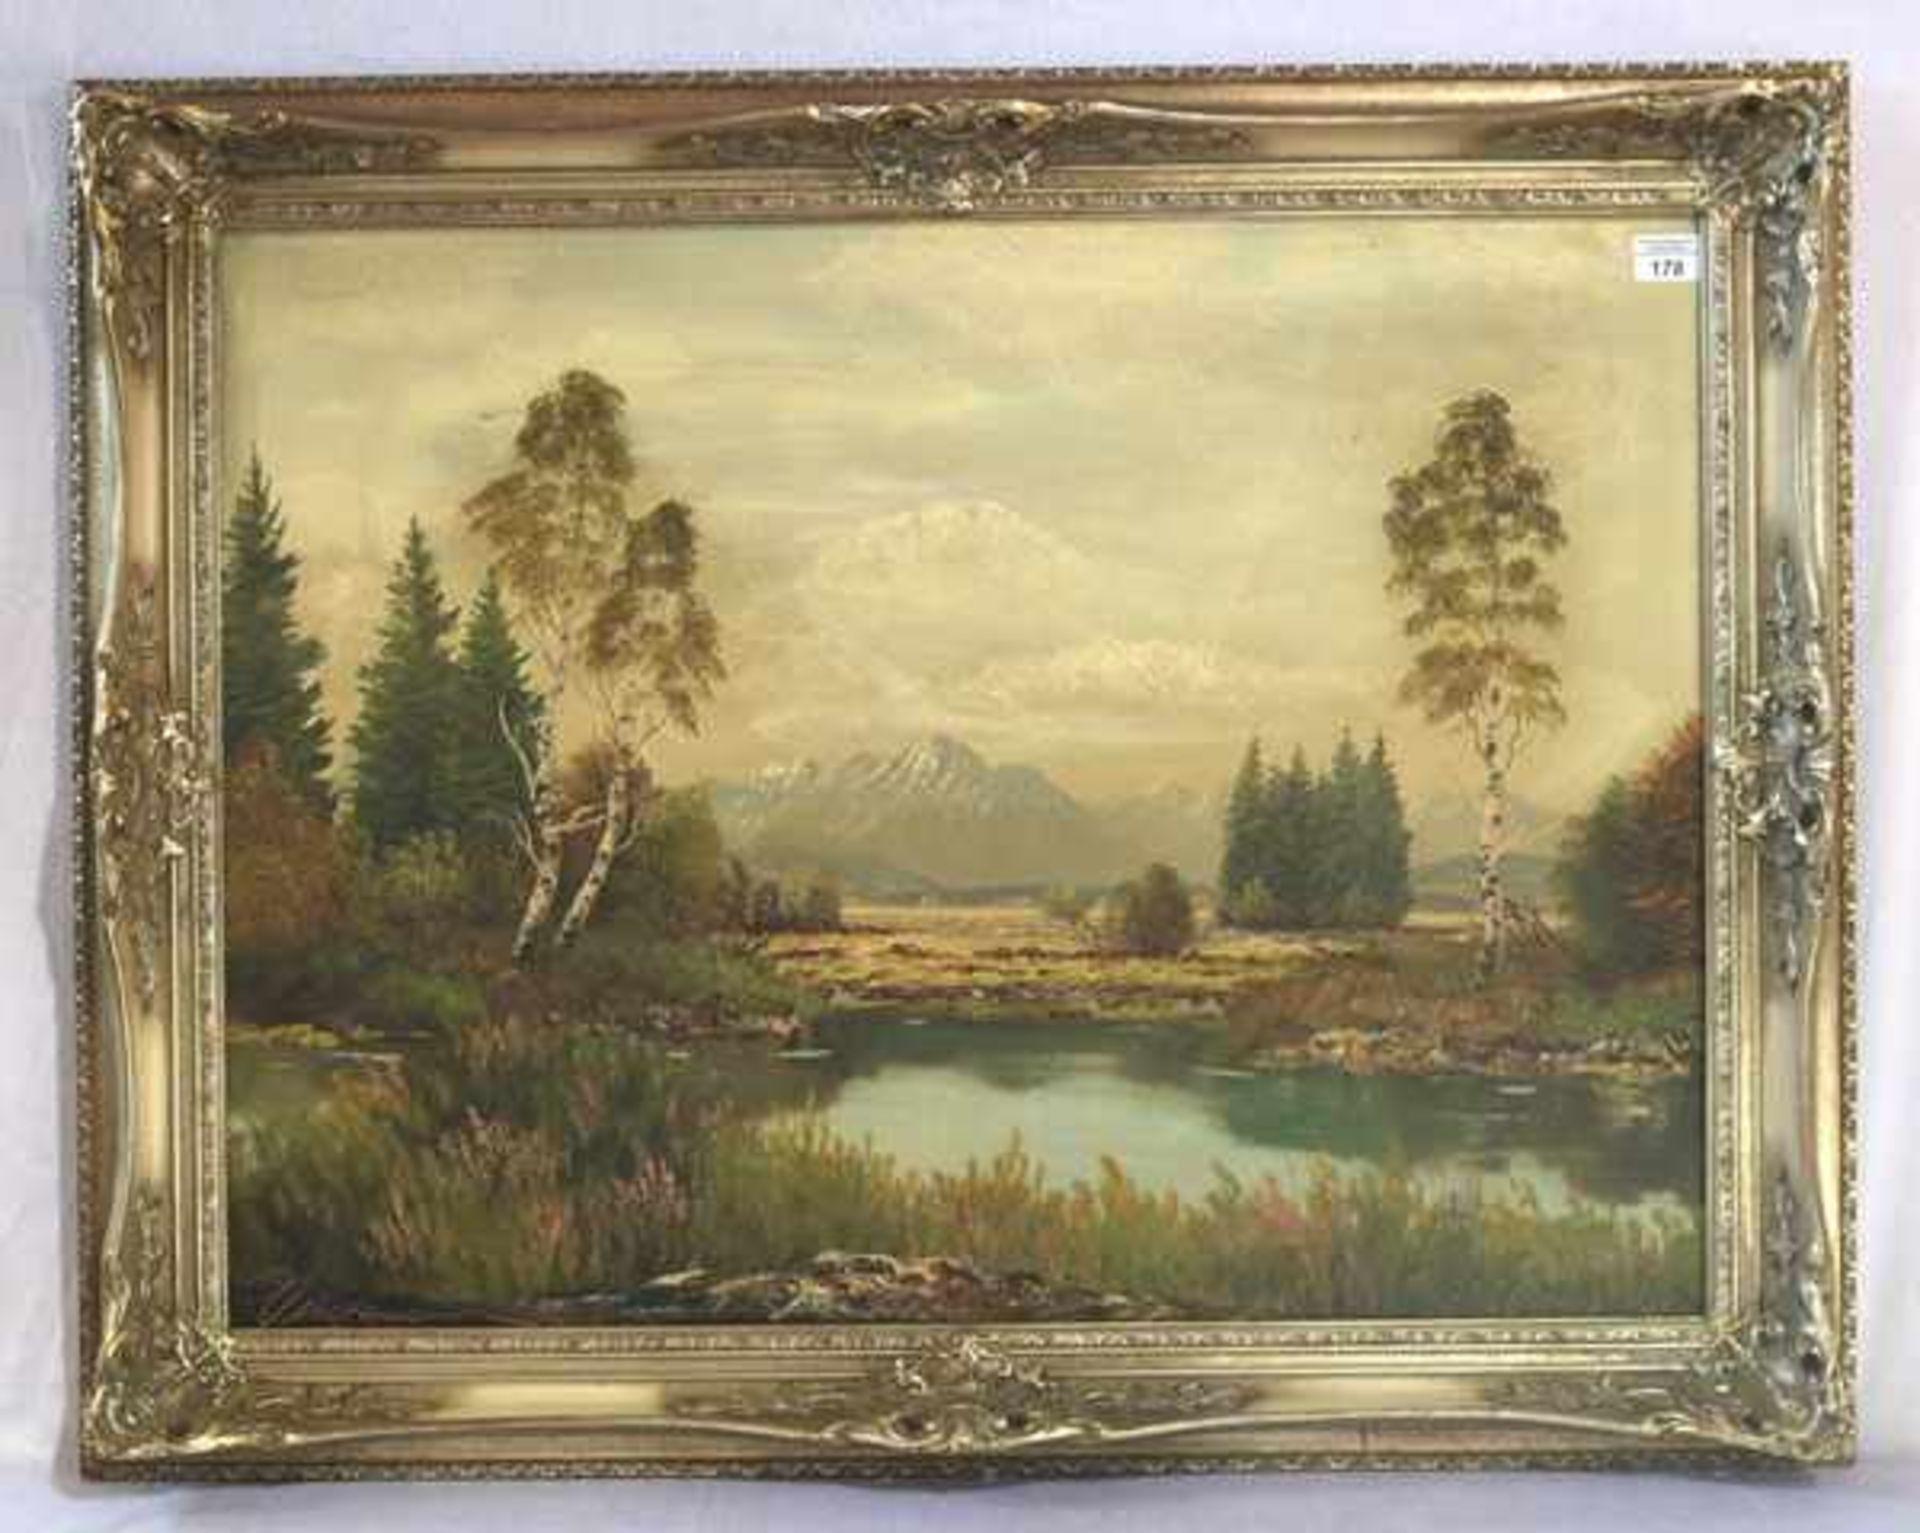 Los 178 - Gemälde ÖL/LW 'Moorlandschaft bei Bad Aibling', signiert Wiedemann, Münchner Landschaftsmaler,